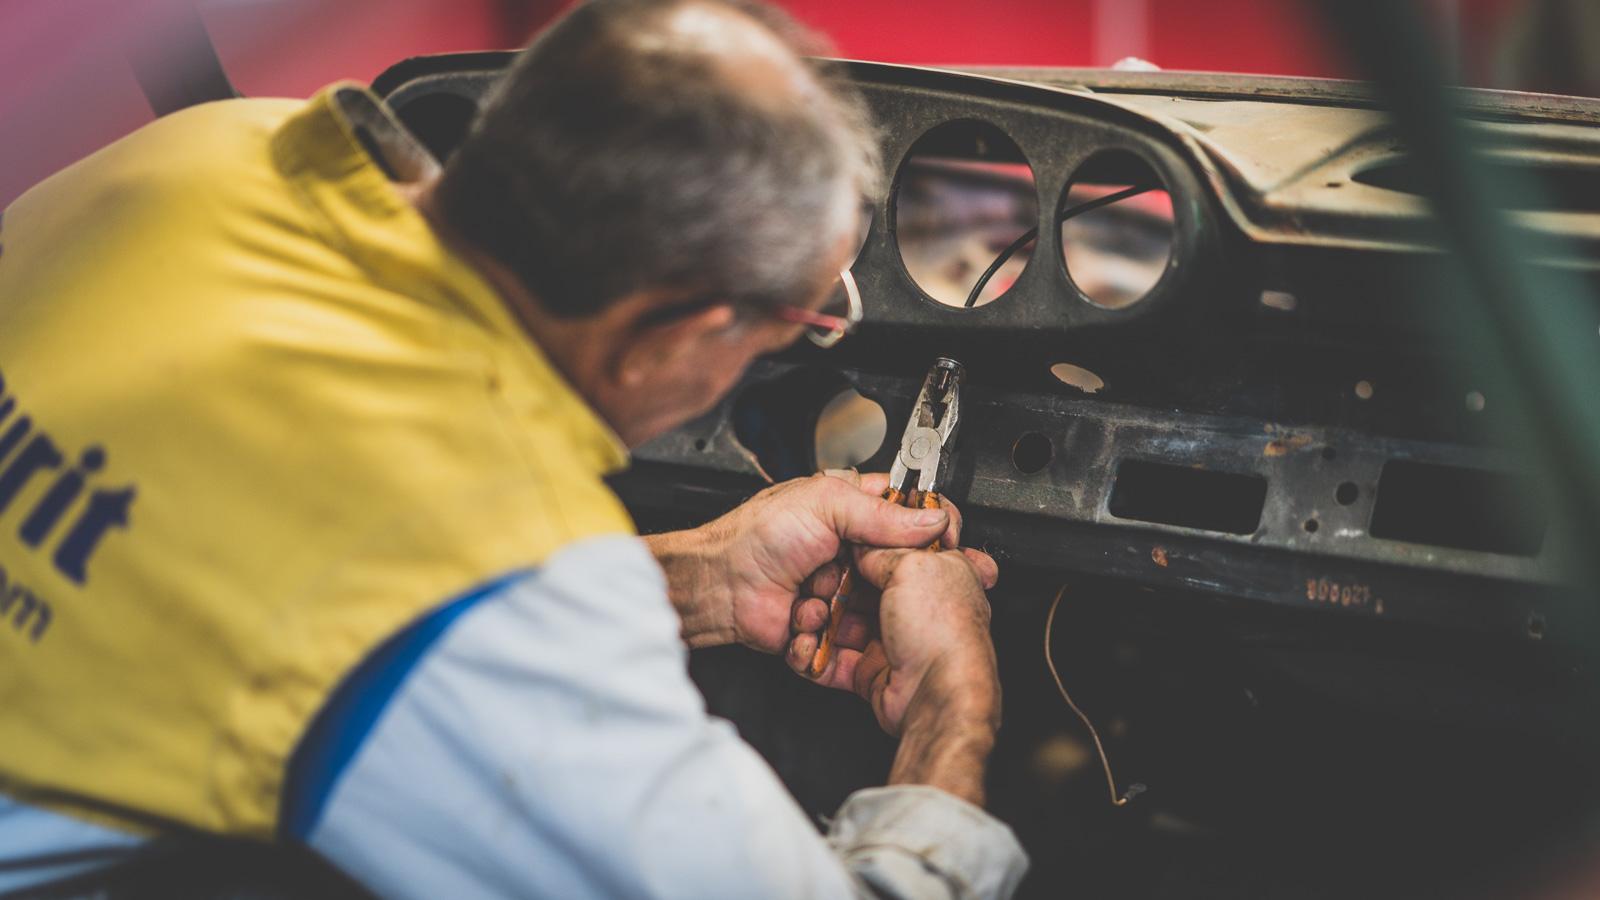 Carrozzeria Bottini Porsche 911 smontaggio